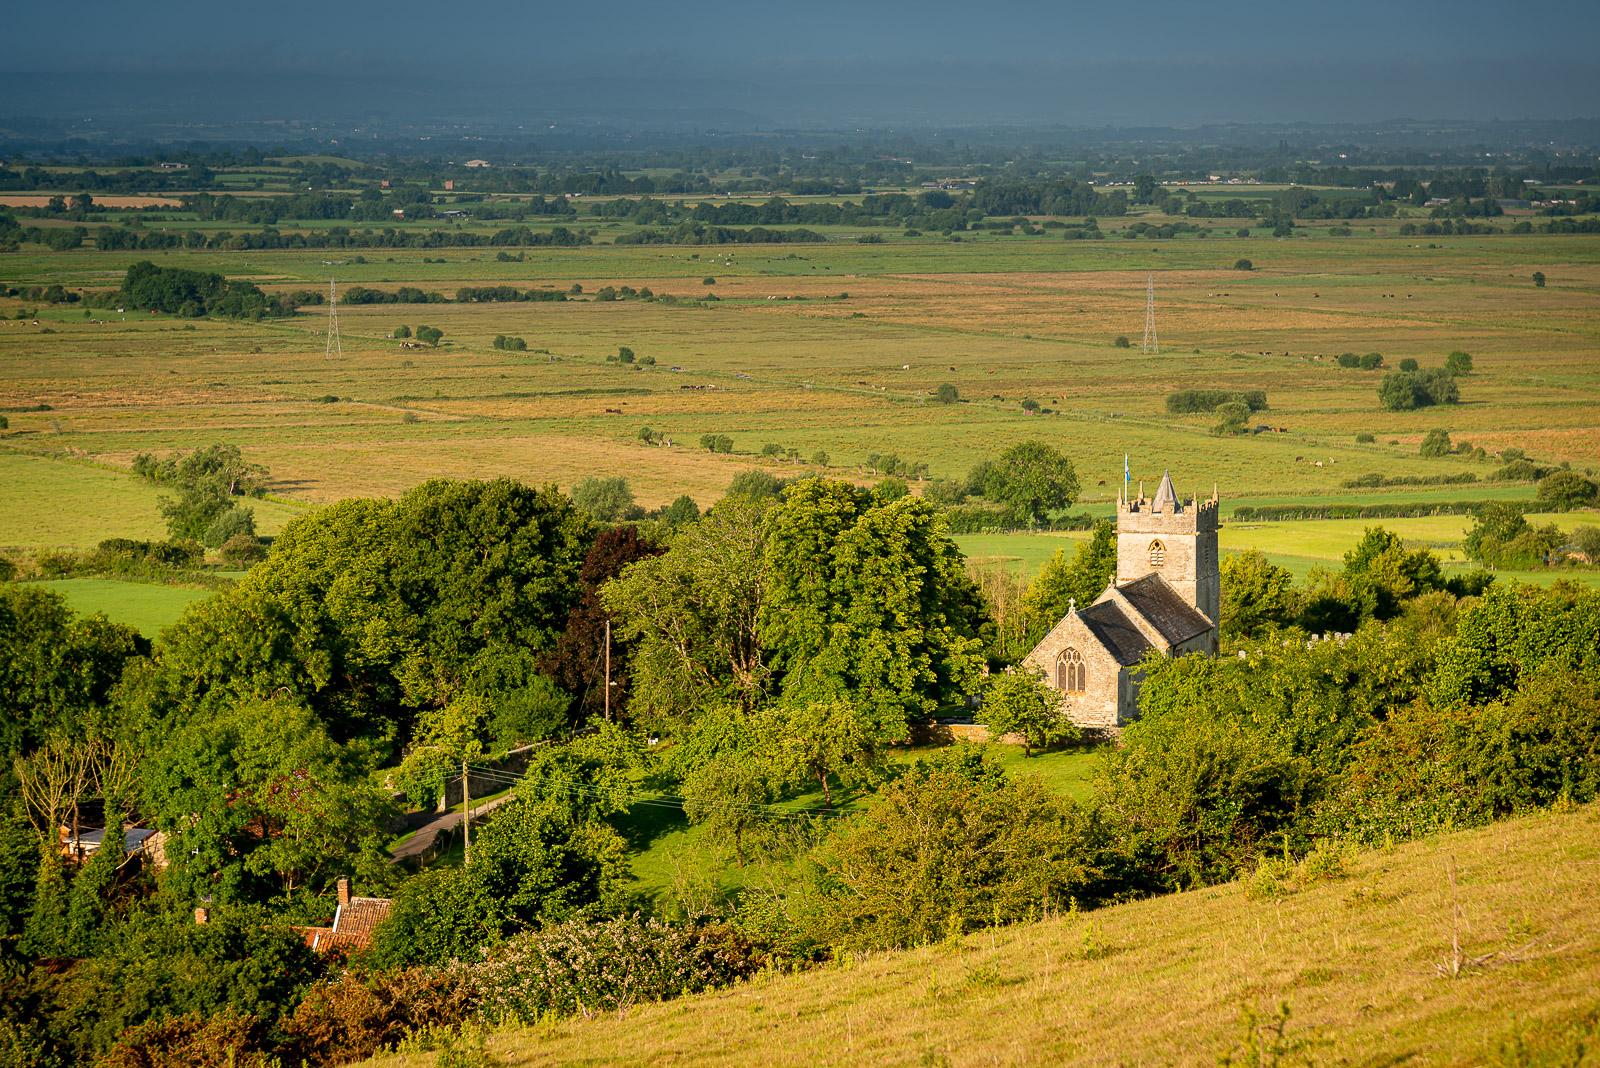 Church of St Mary - Moorlinch, Somerset, UK. ID JB1_4633